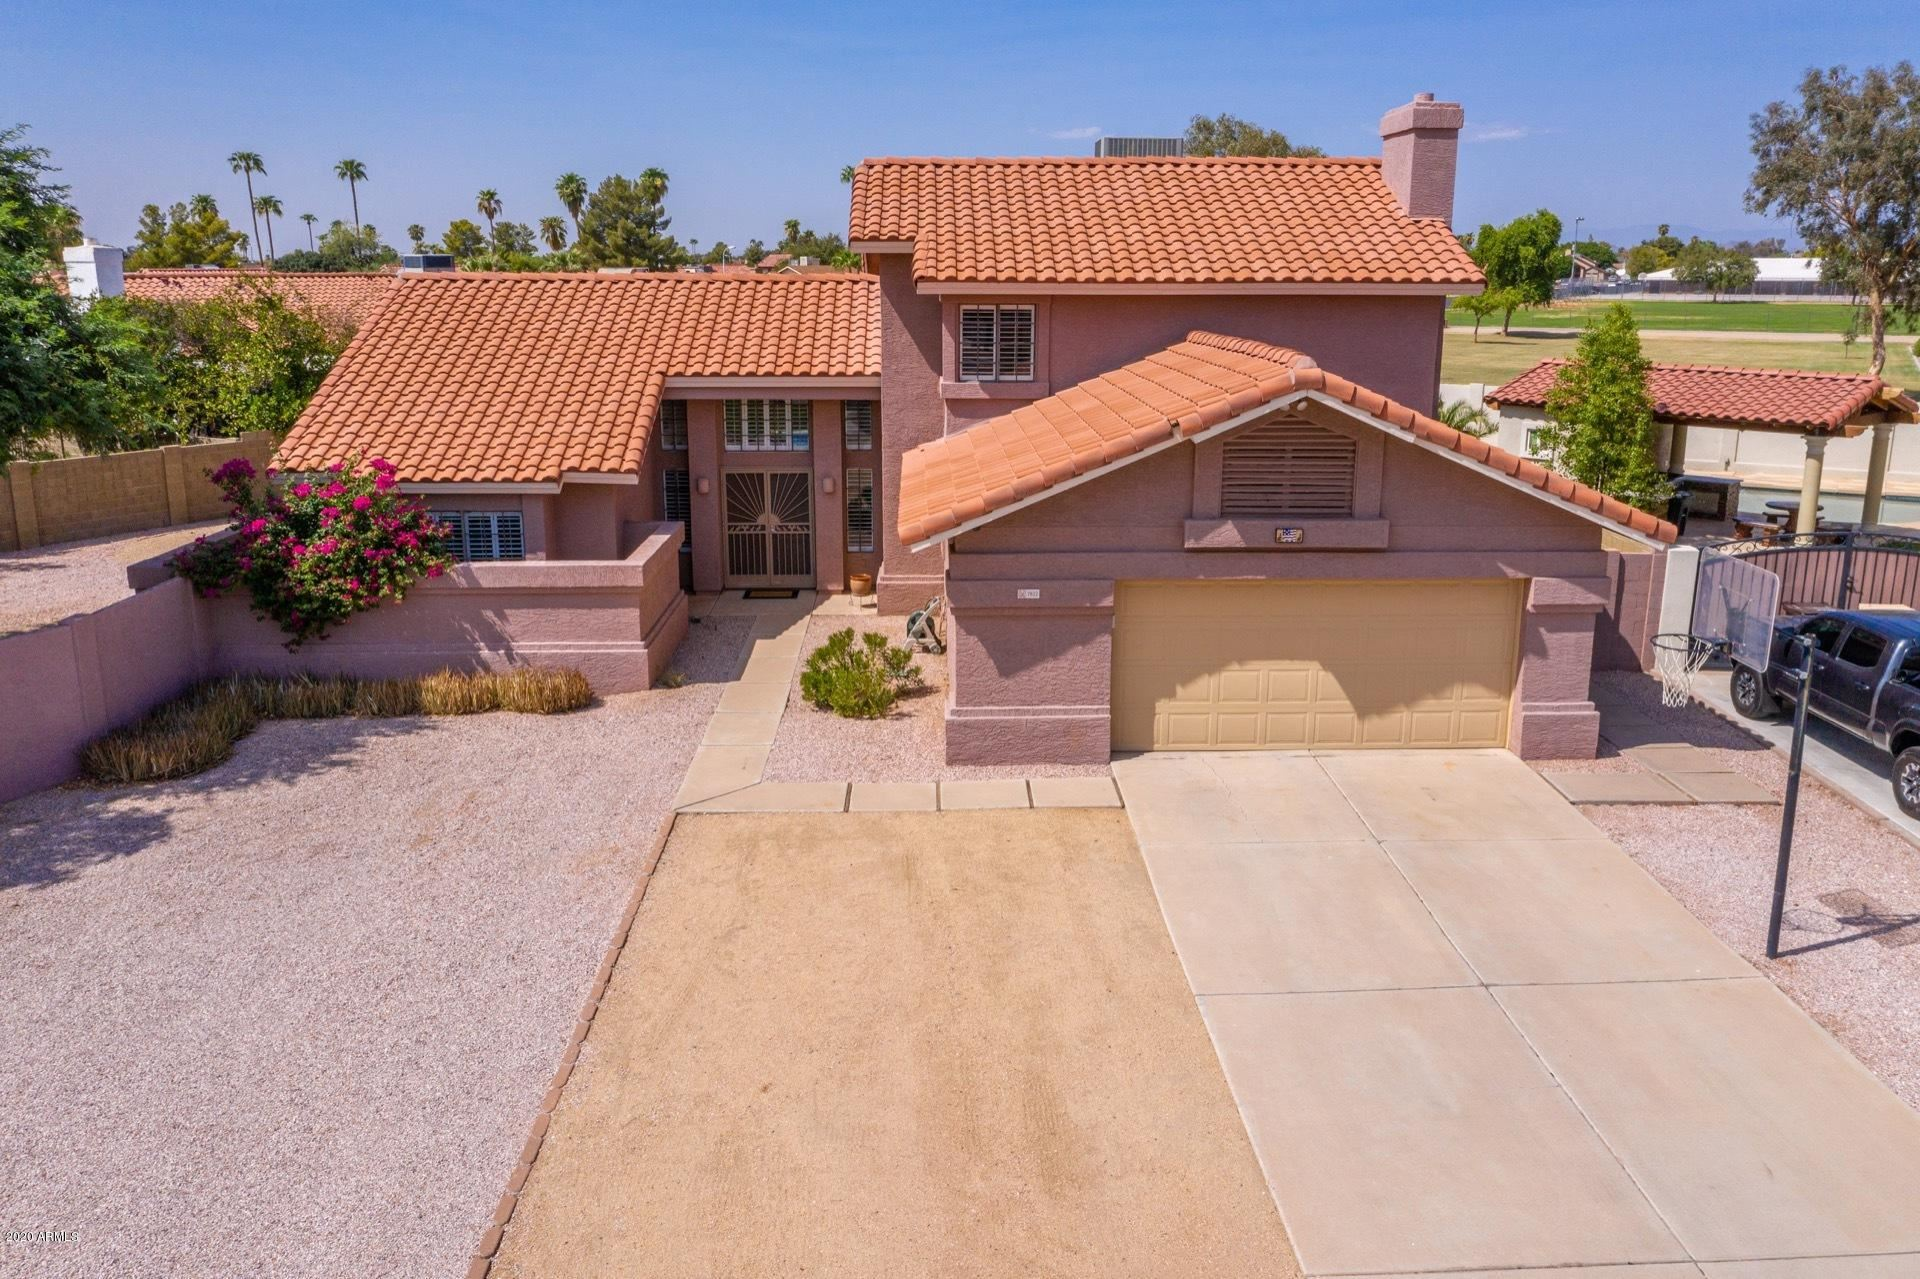 7822 W COLUMBINE Drive, Peoria, AZ 85381 - MLS#: 6131477